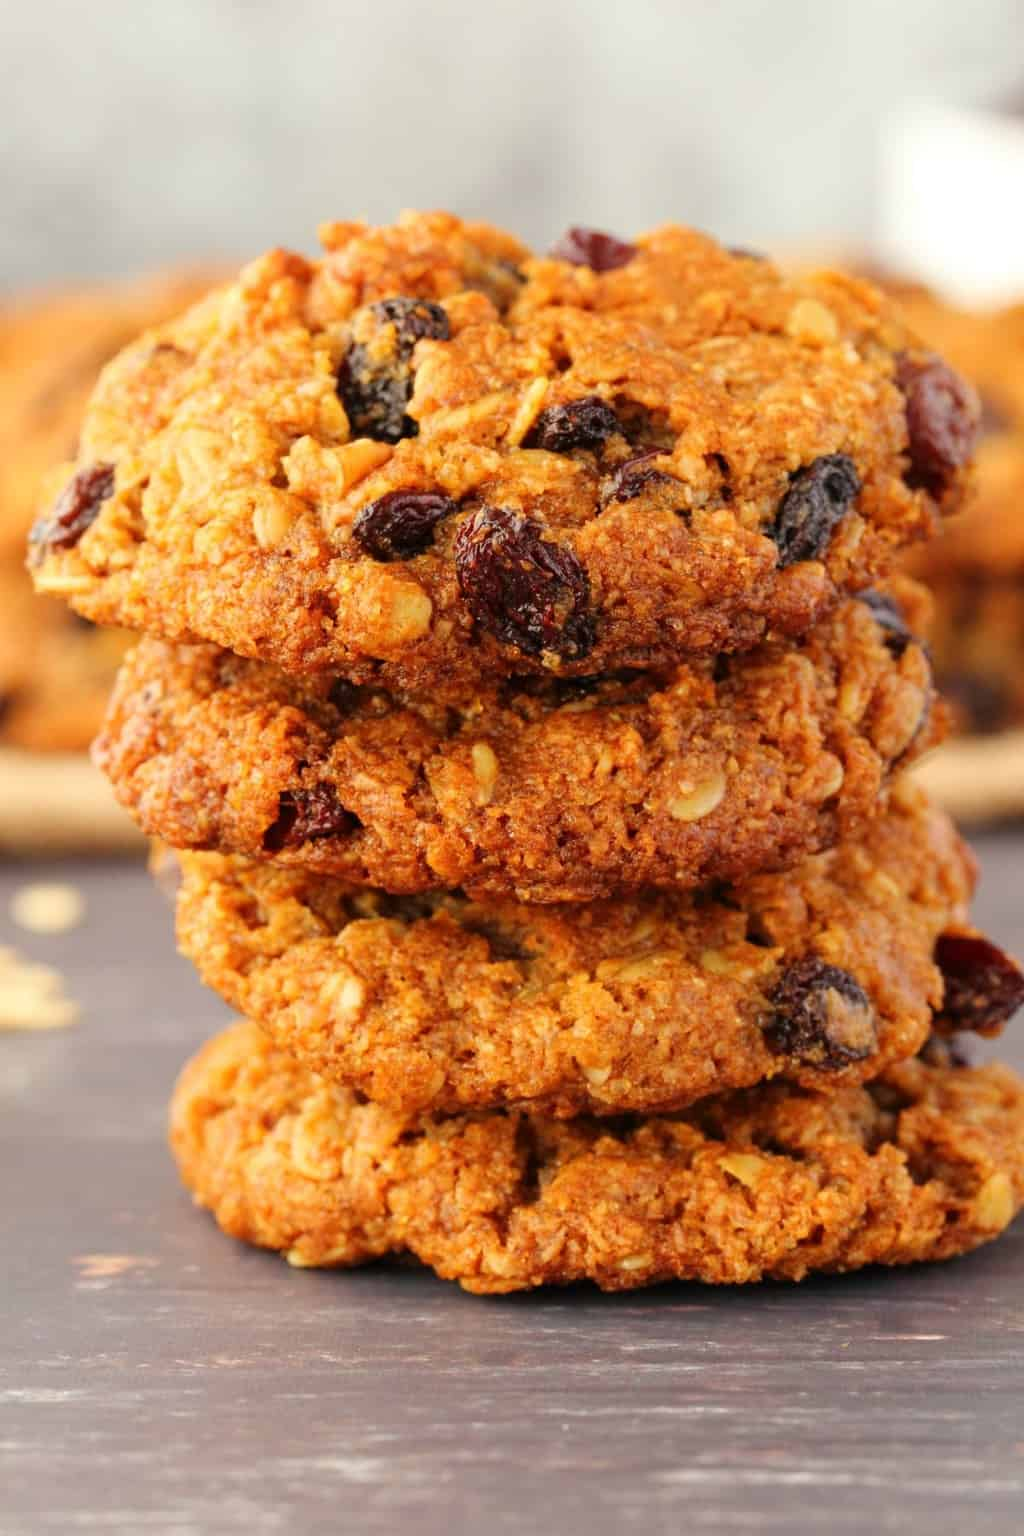 Vegan oatmeal raisin cookies in a stack of four.